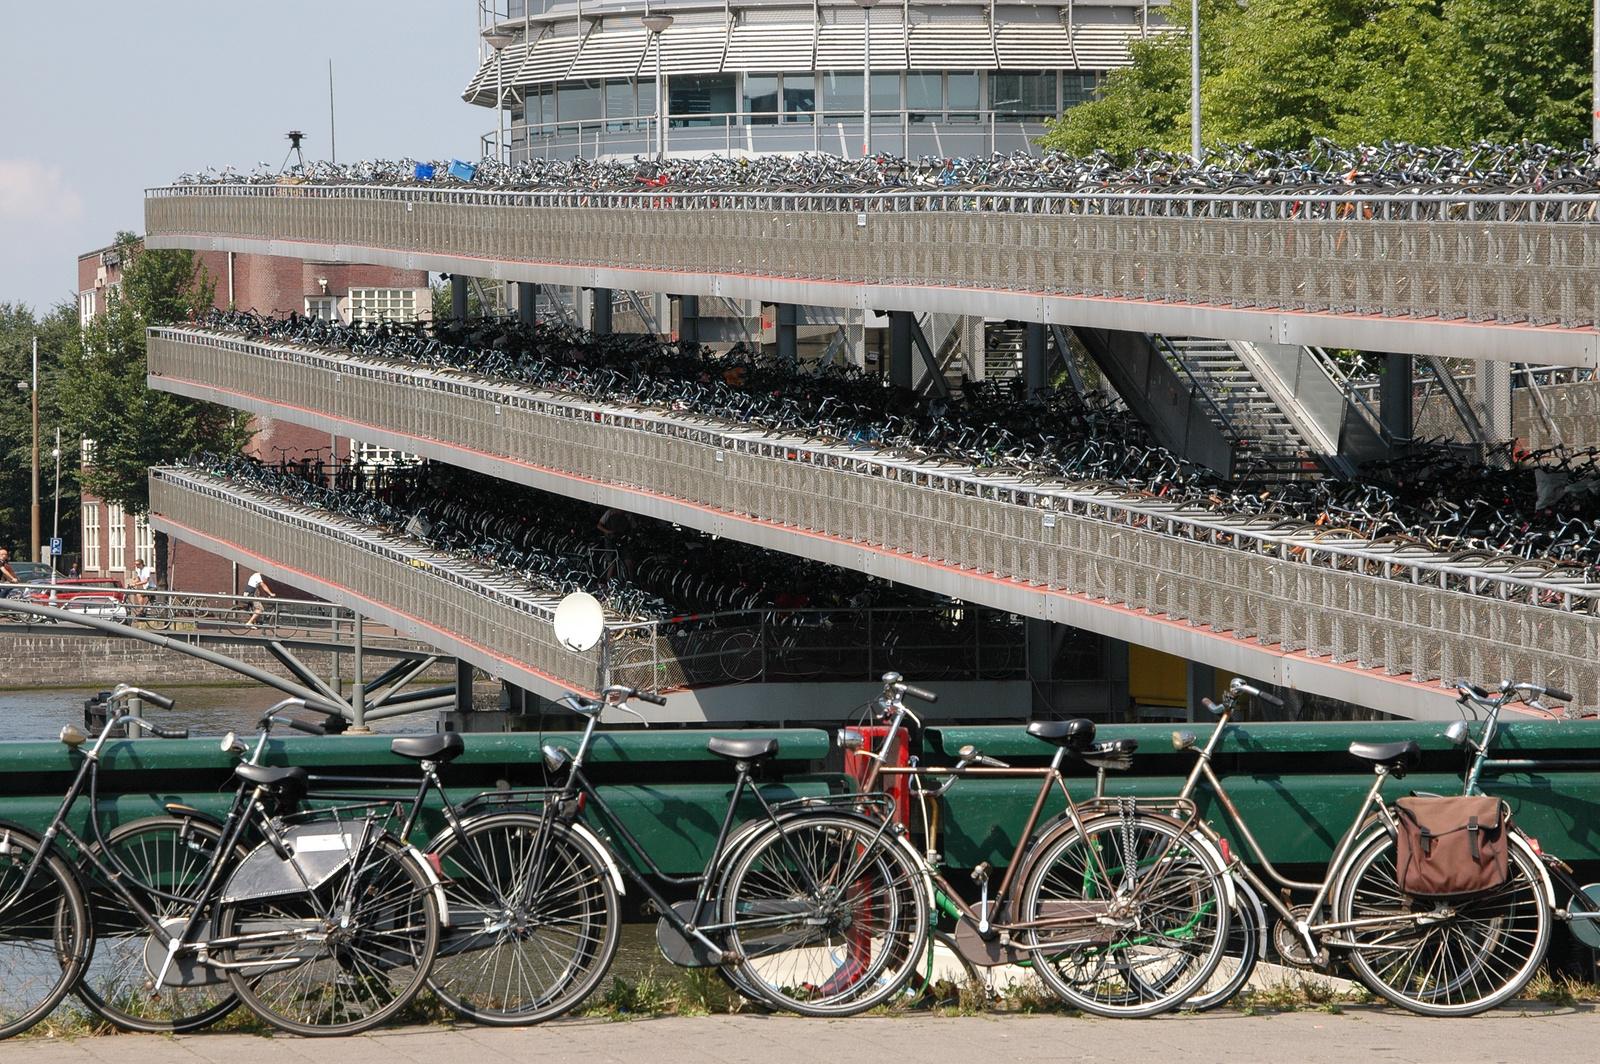 Fahrradgarage in Amsterdam